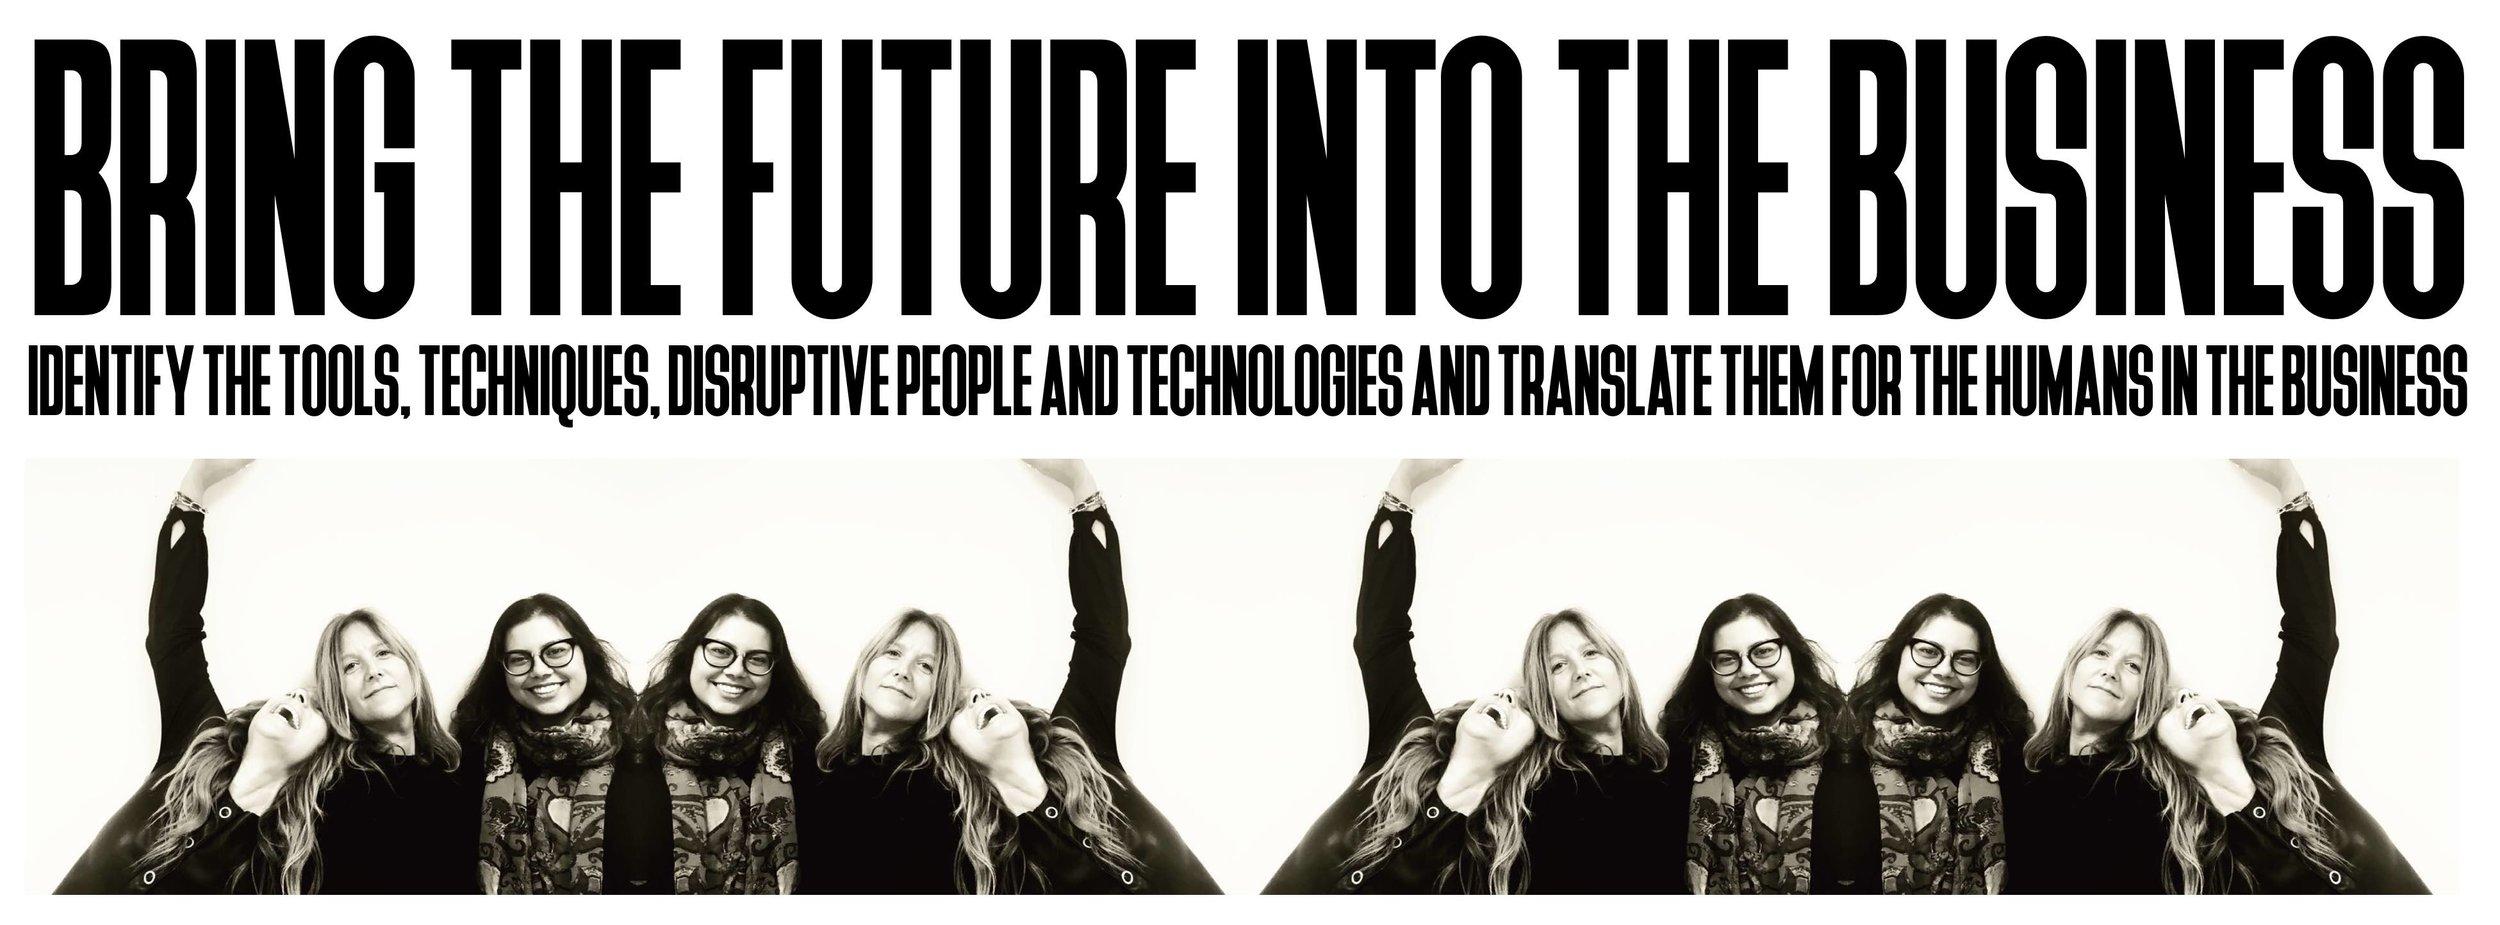 NYC - THE FUTURE.jpg